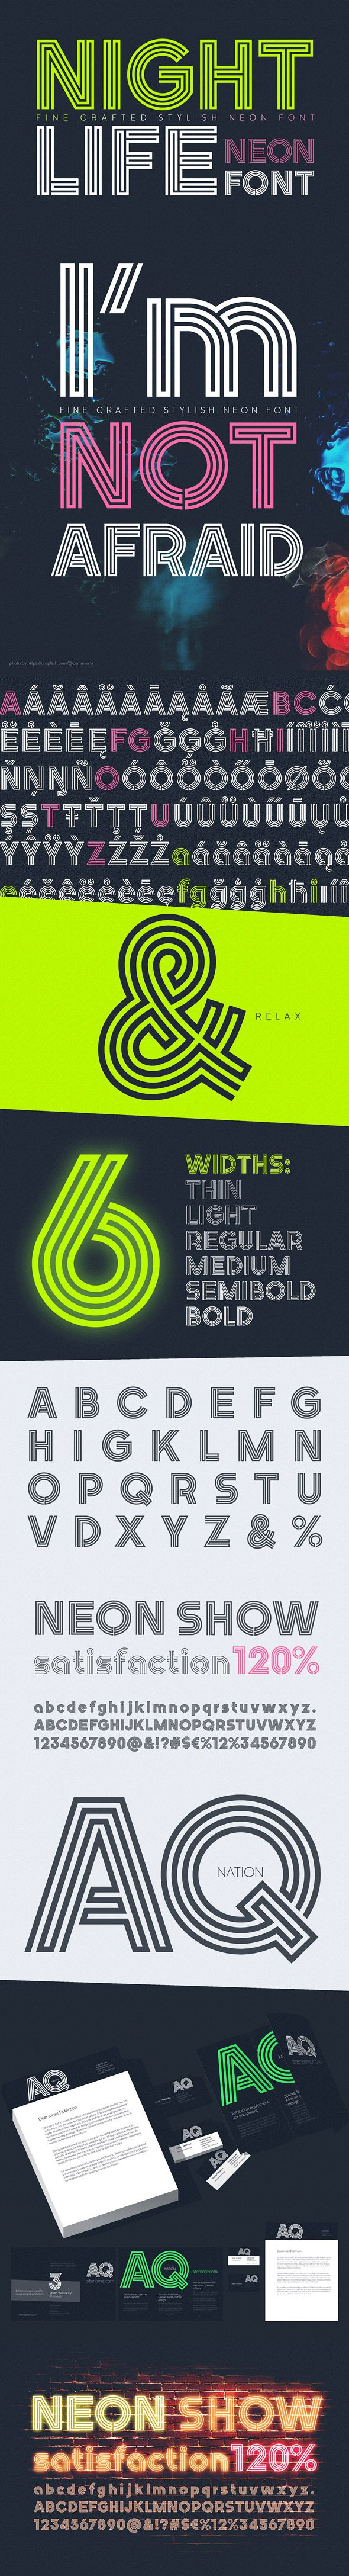 #Nightlife Decorative Neon Font - #Decorative #Fonts Download here: https://graphicriver.net/item/nightlife-decorative-neon-font/20263748?ref=alena994